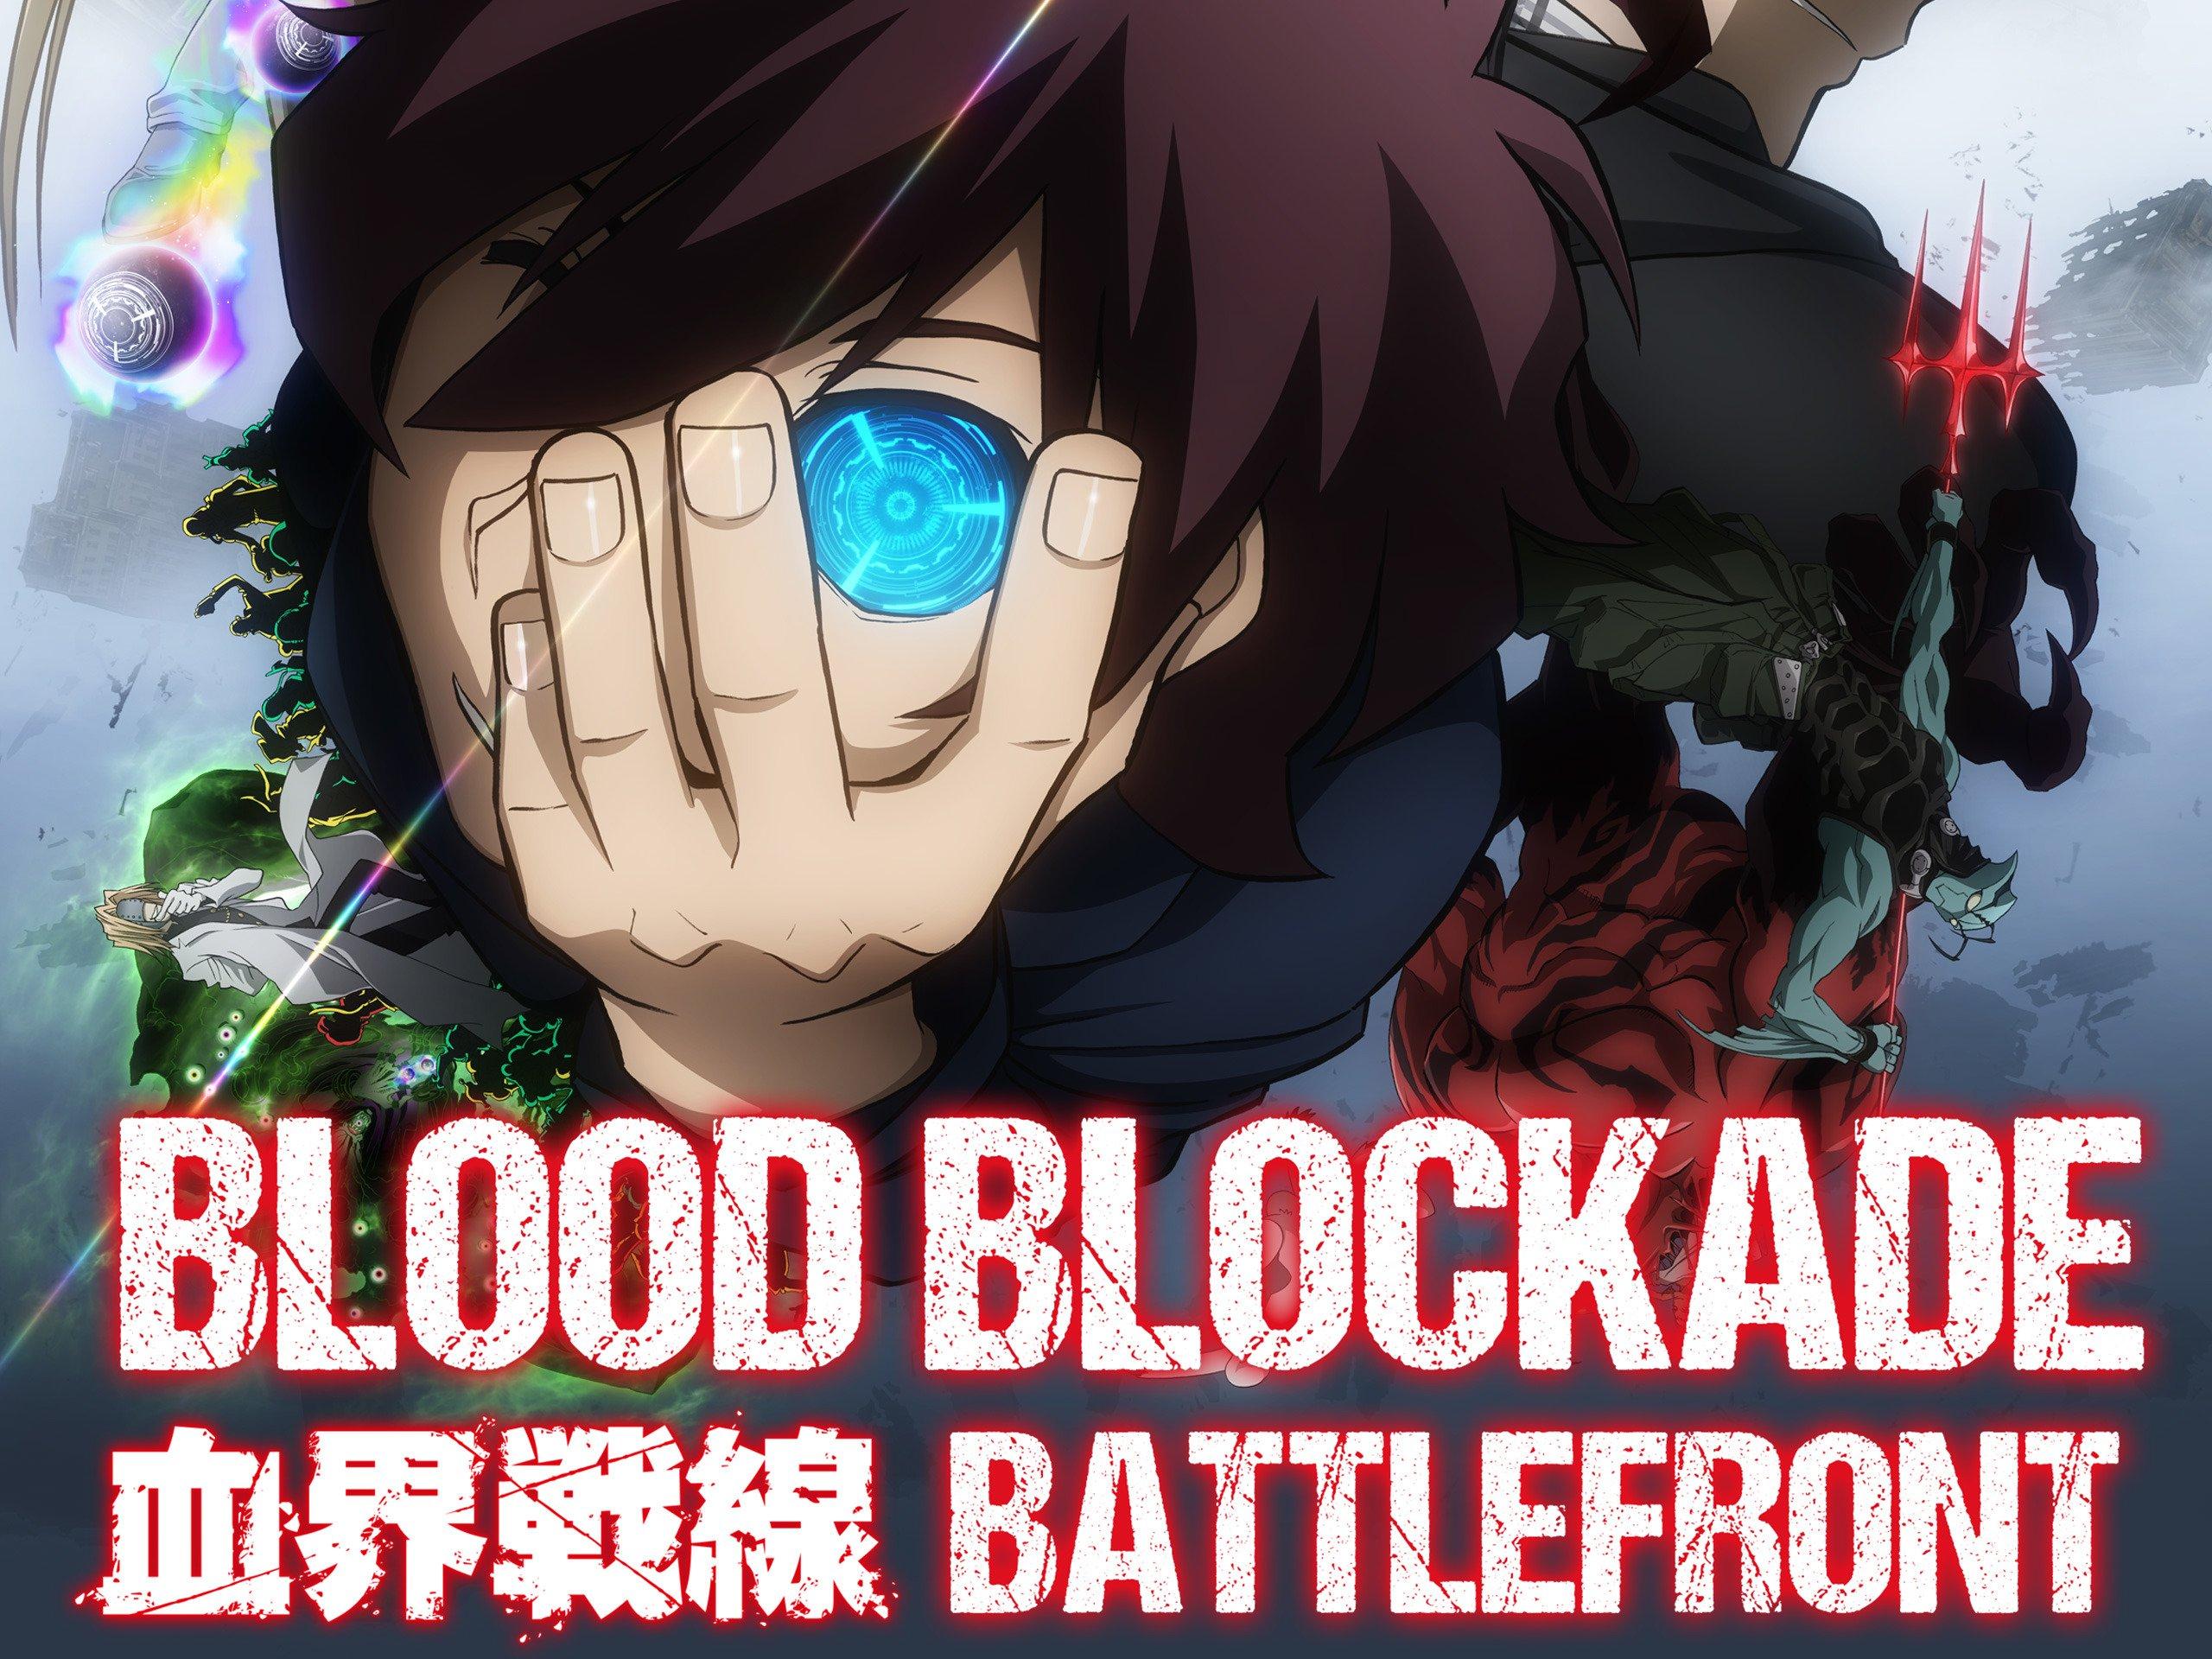 Blood Blockade Battlefront Staffel 2